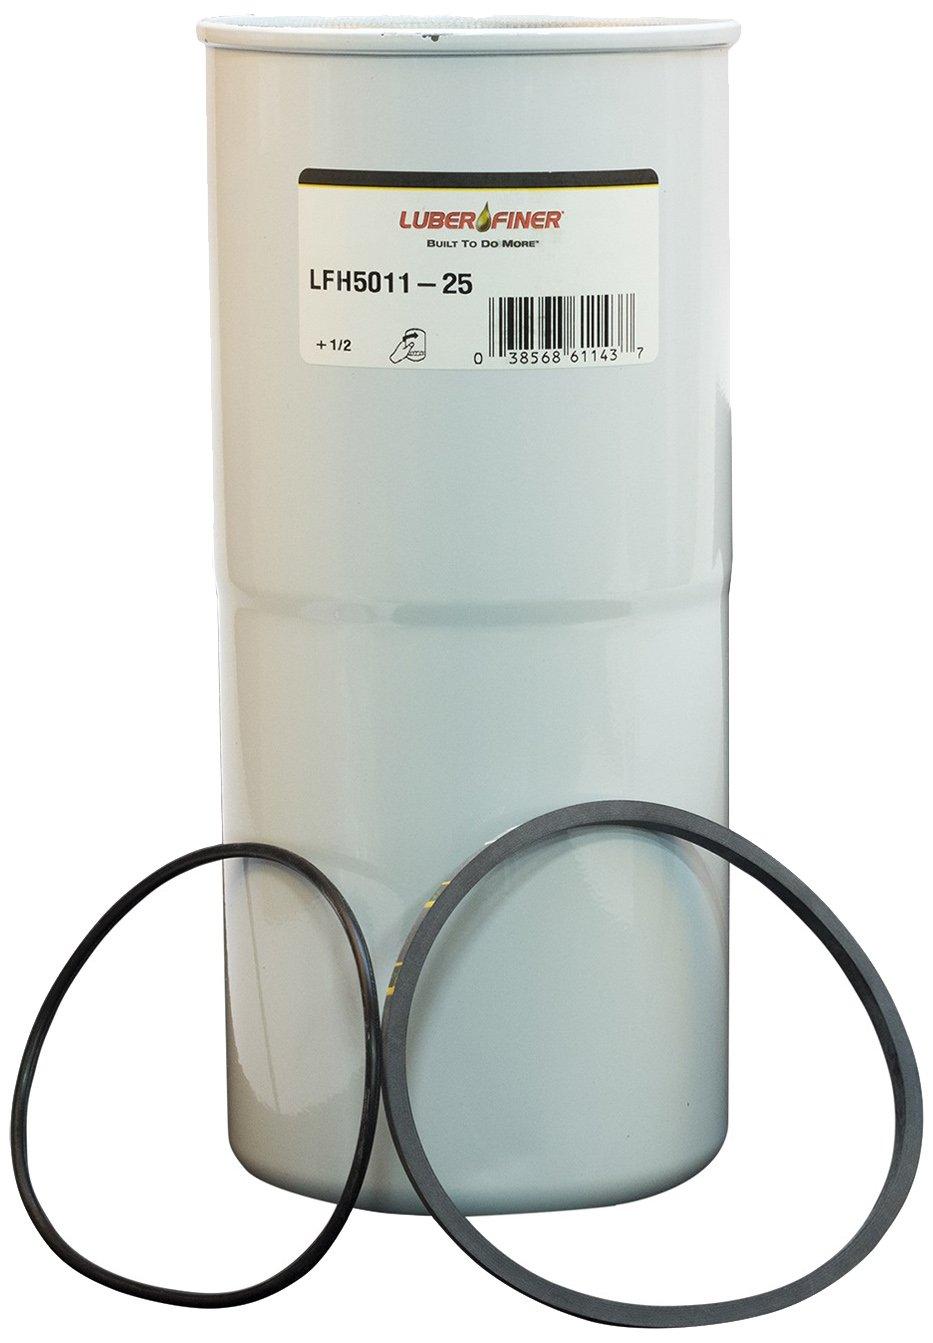 Luber-finer LFH5011-25 Hydraulic Filter